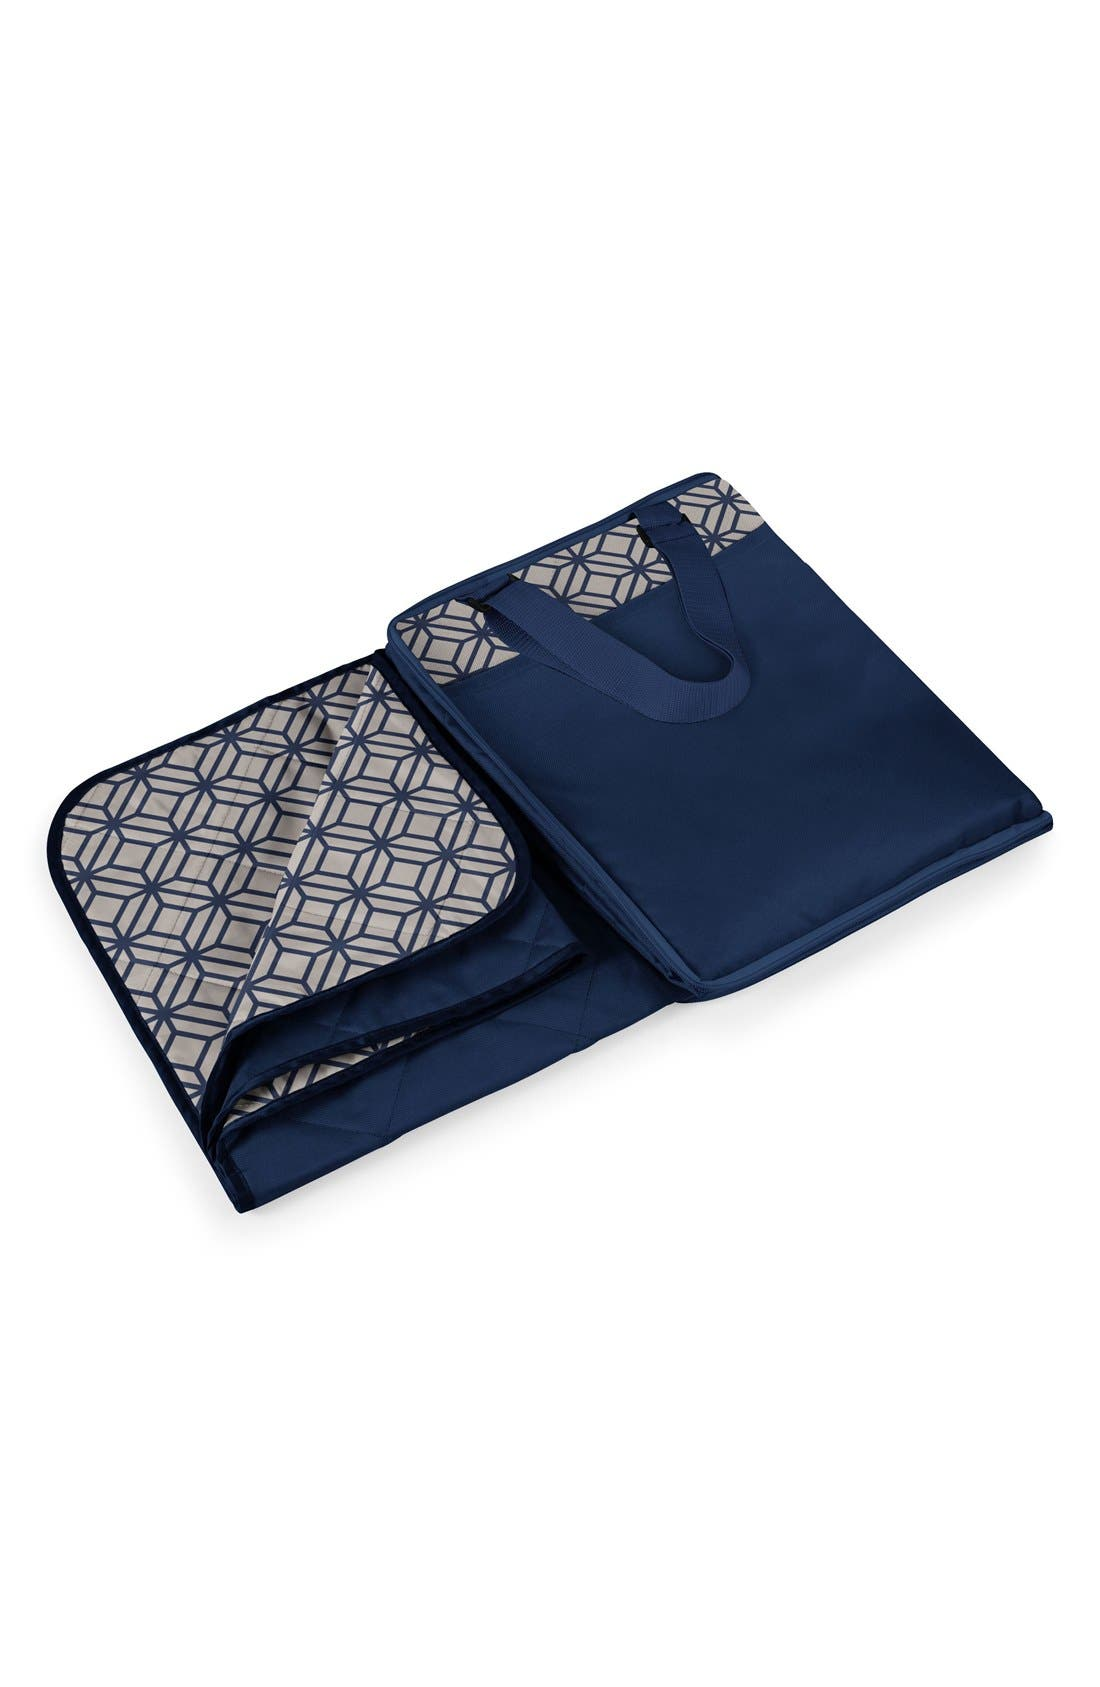 PICNIC TIME 'Vista XL' Fold-Up Blanket Tote